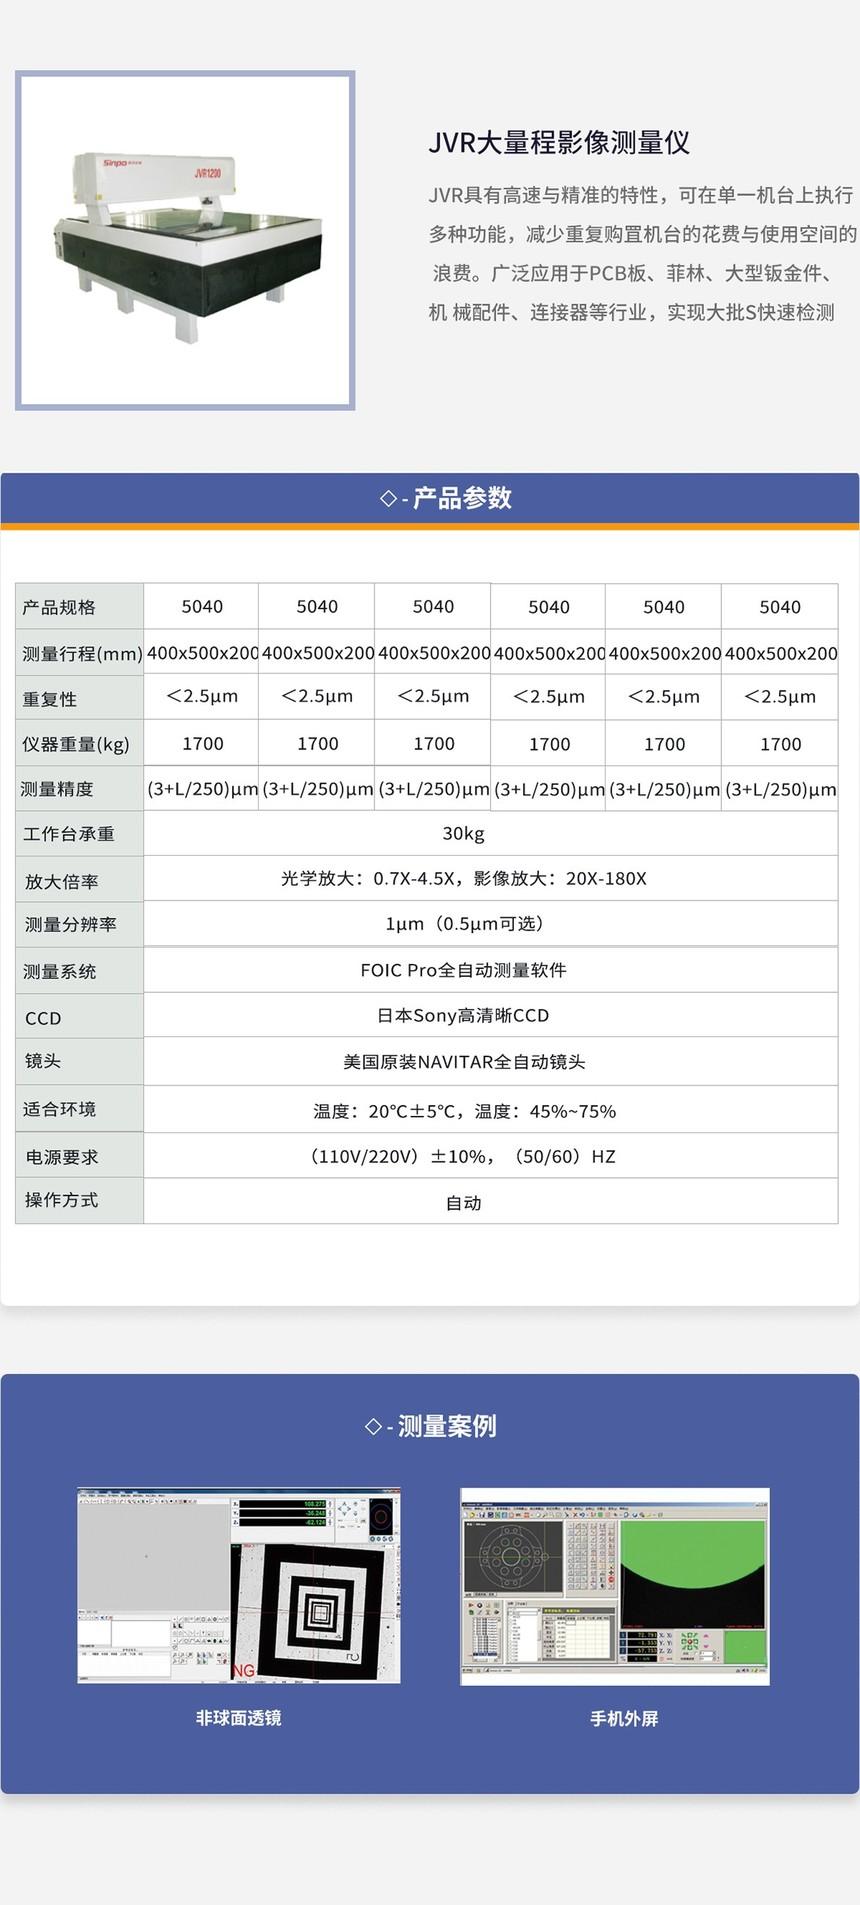 jVr大量程影像测量仪_02.jpg